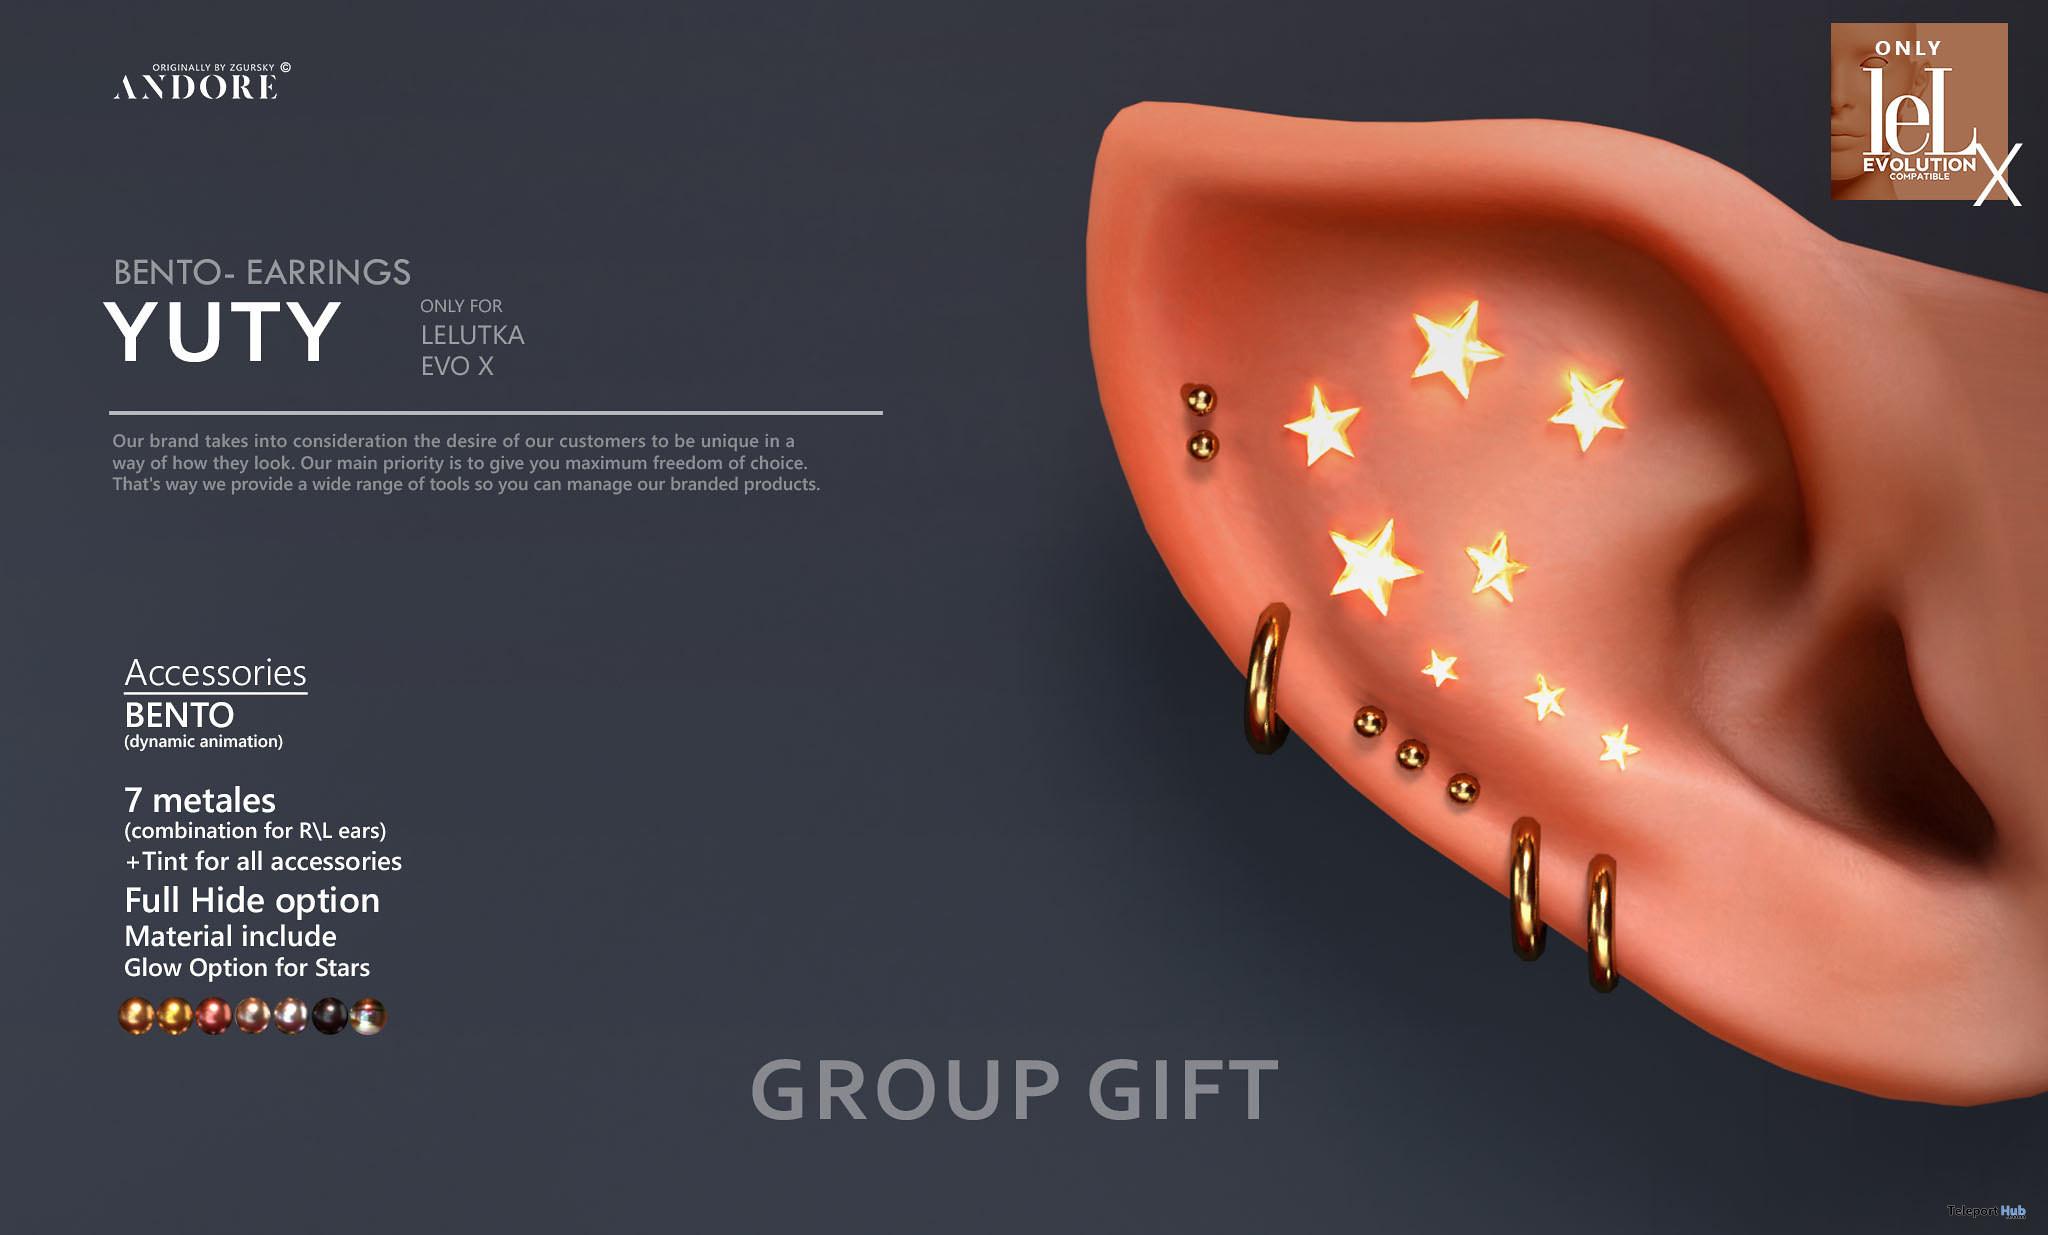 Yuty Bento Earrings June 2021 Group Gift by ANDORE - Teleport Hub - teleporthub.com